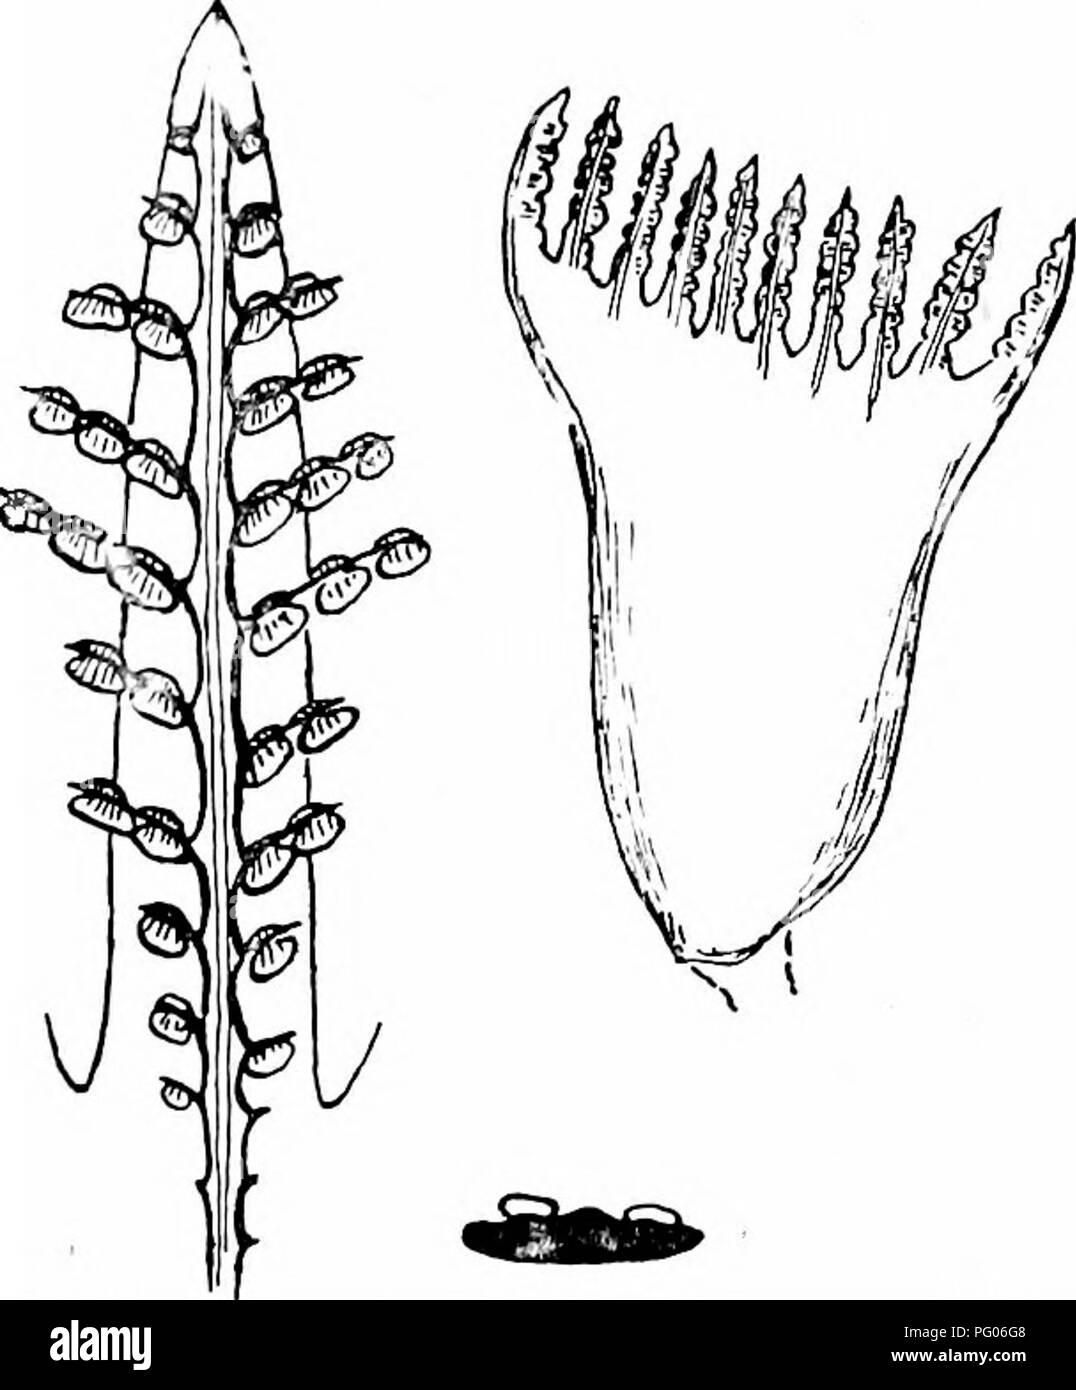 Unisexual flowers diagrams